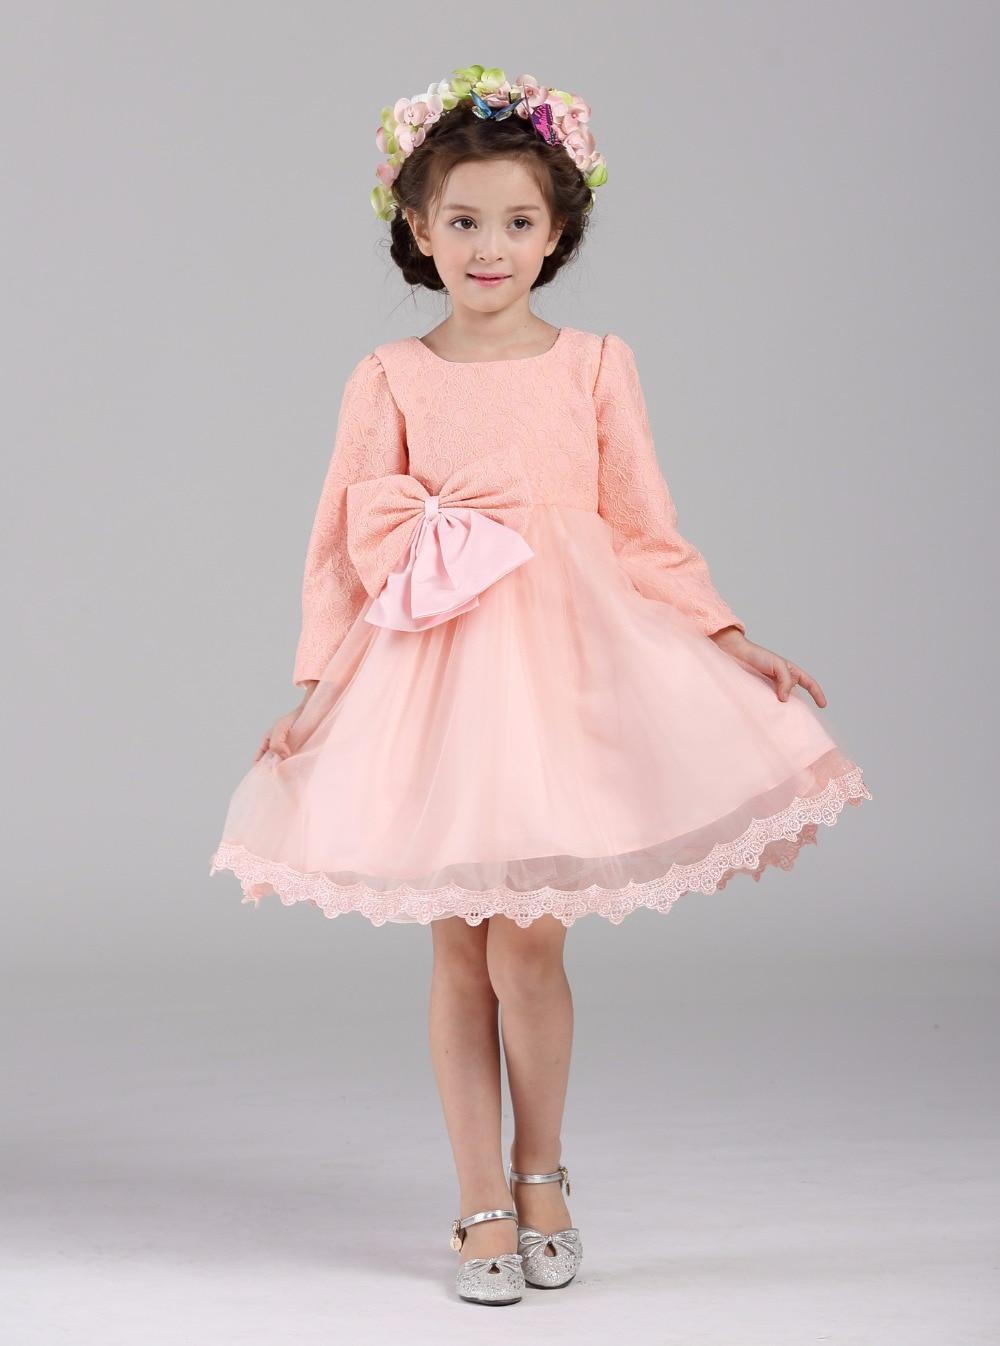 Medium Crop Of Long Sleeve Dresses